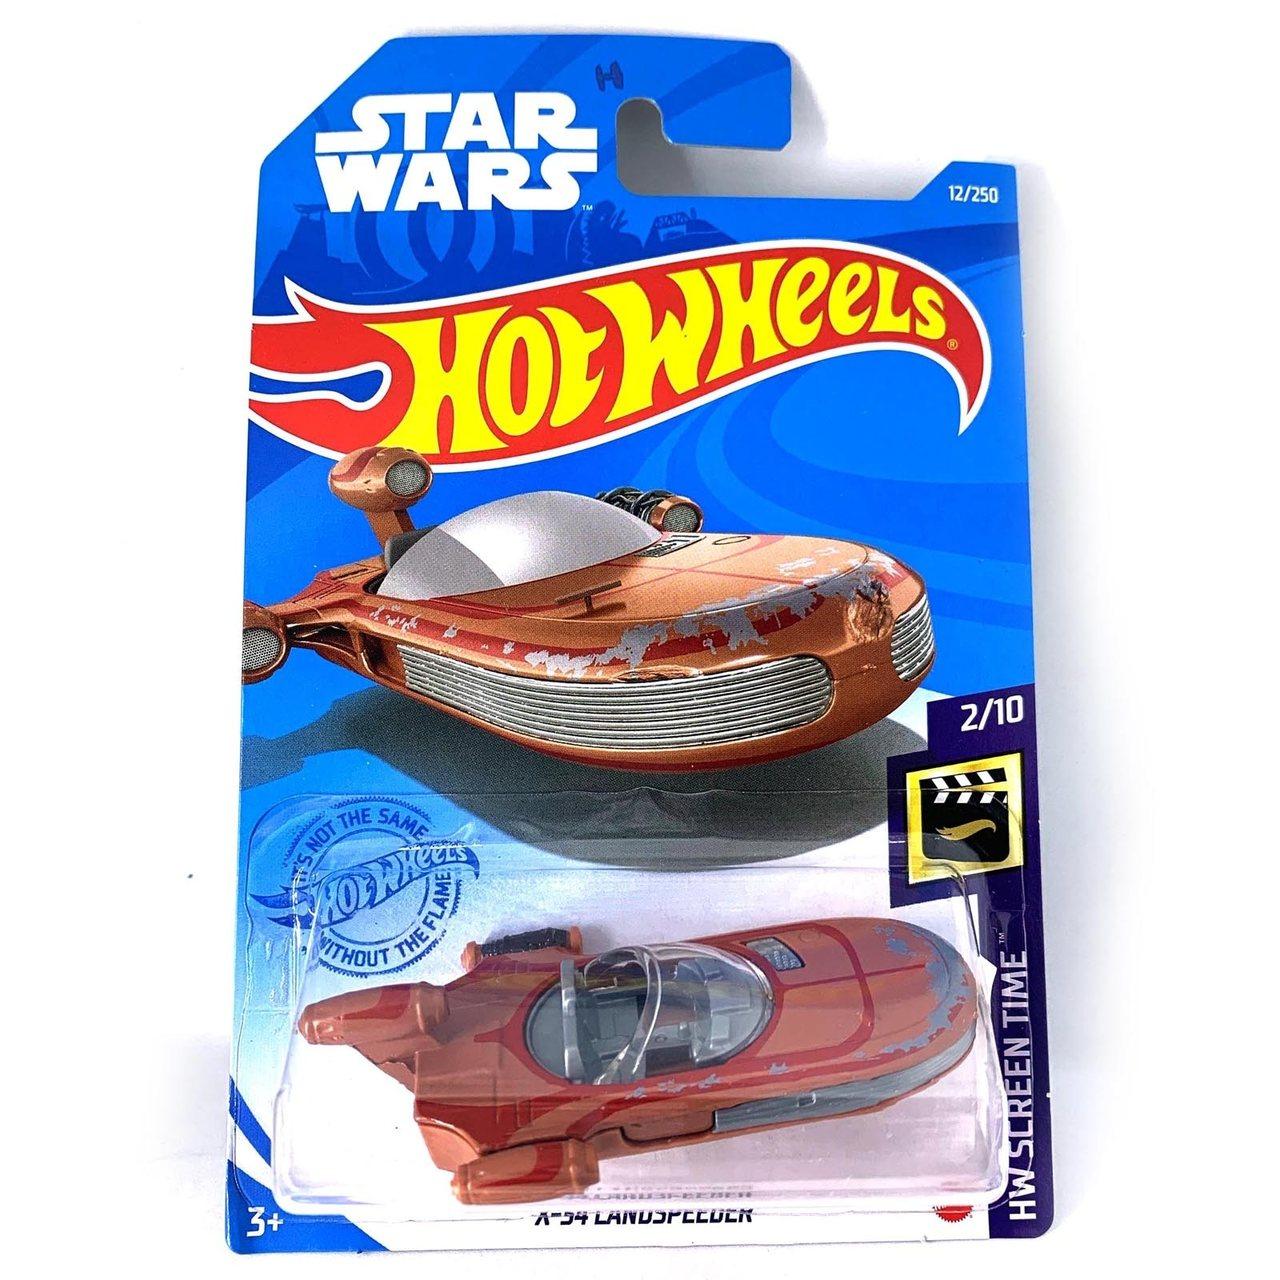 Carrinho Hot Wheels X-34 LandSpeeder: HW Screen Time Star Wars - Mattel